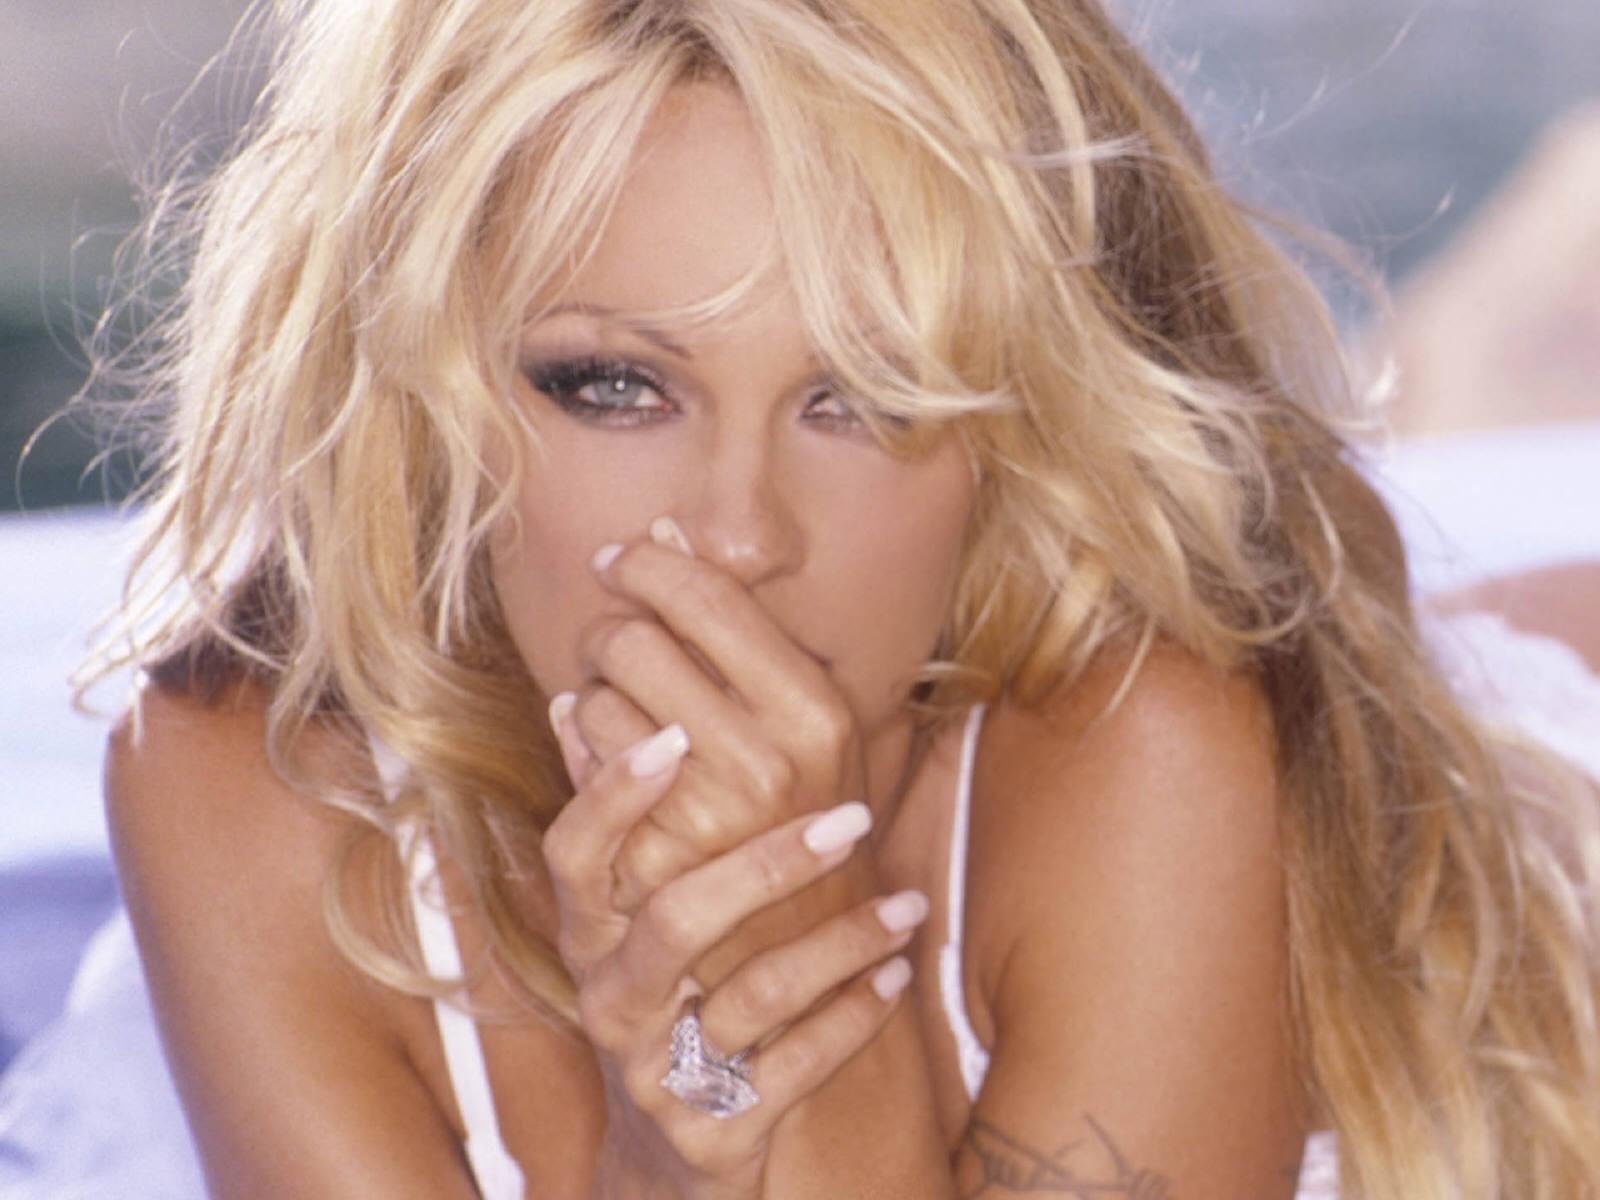 Wallpaper di Pamela Anderson in versione imbronciata